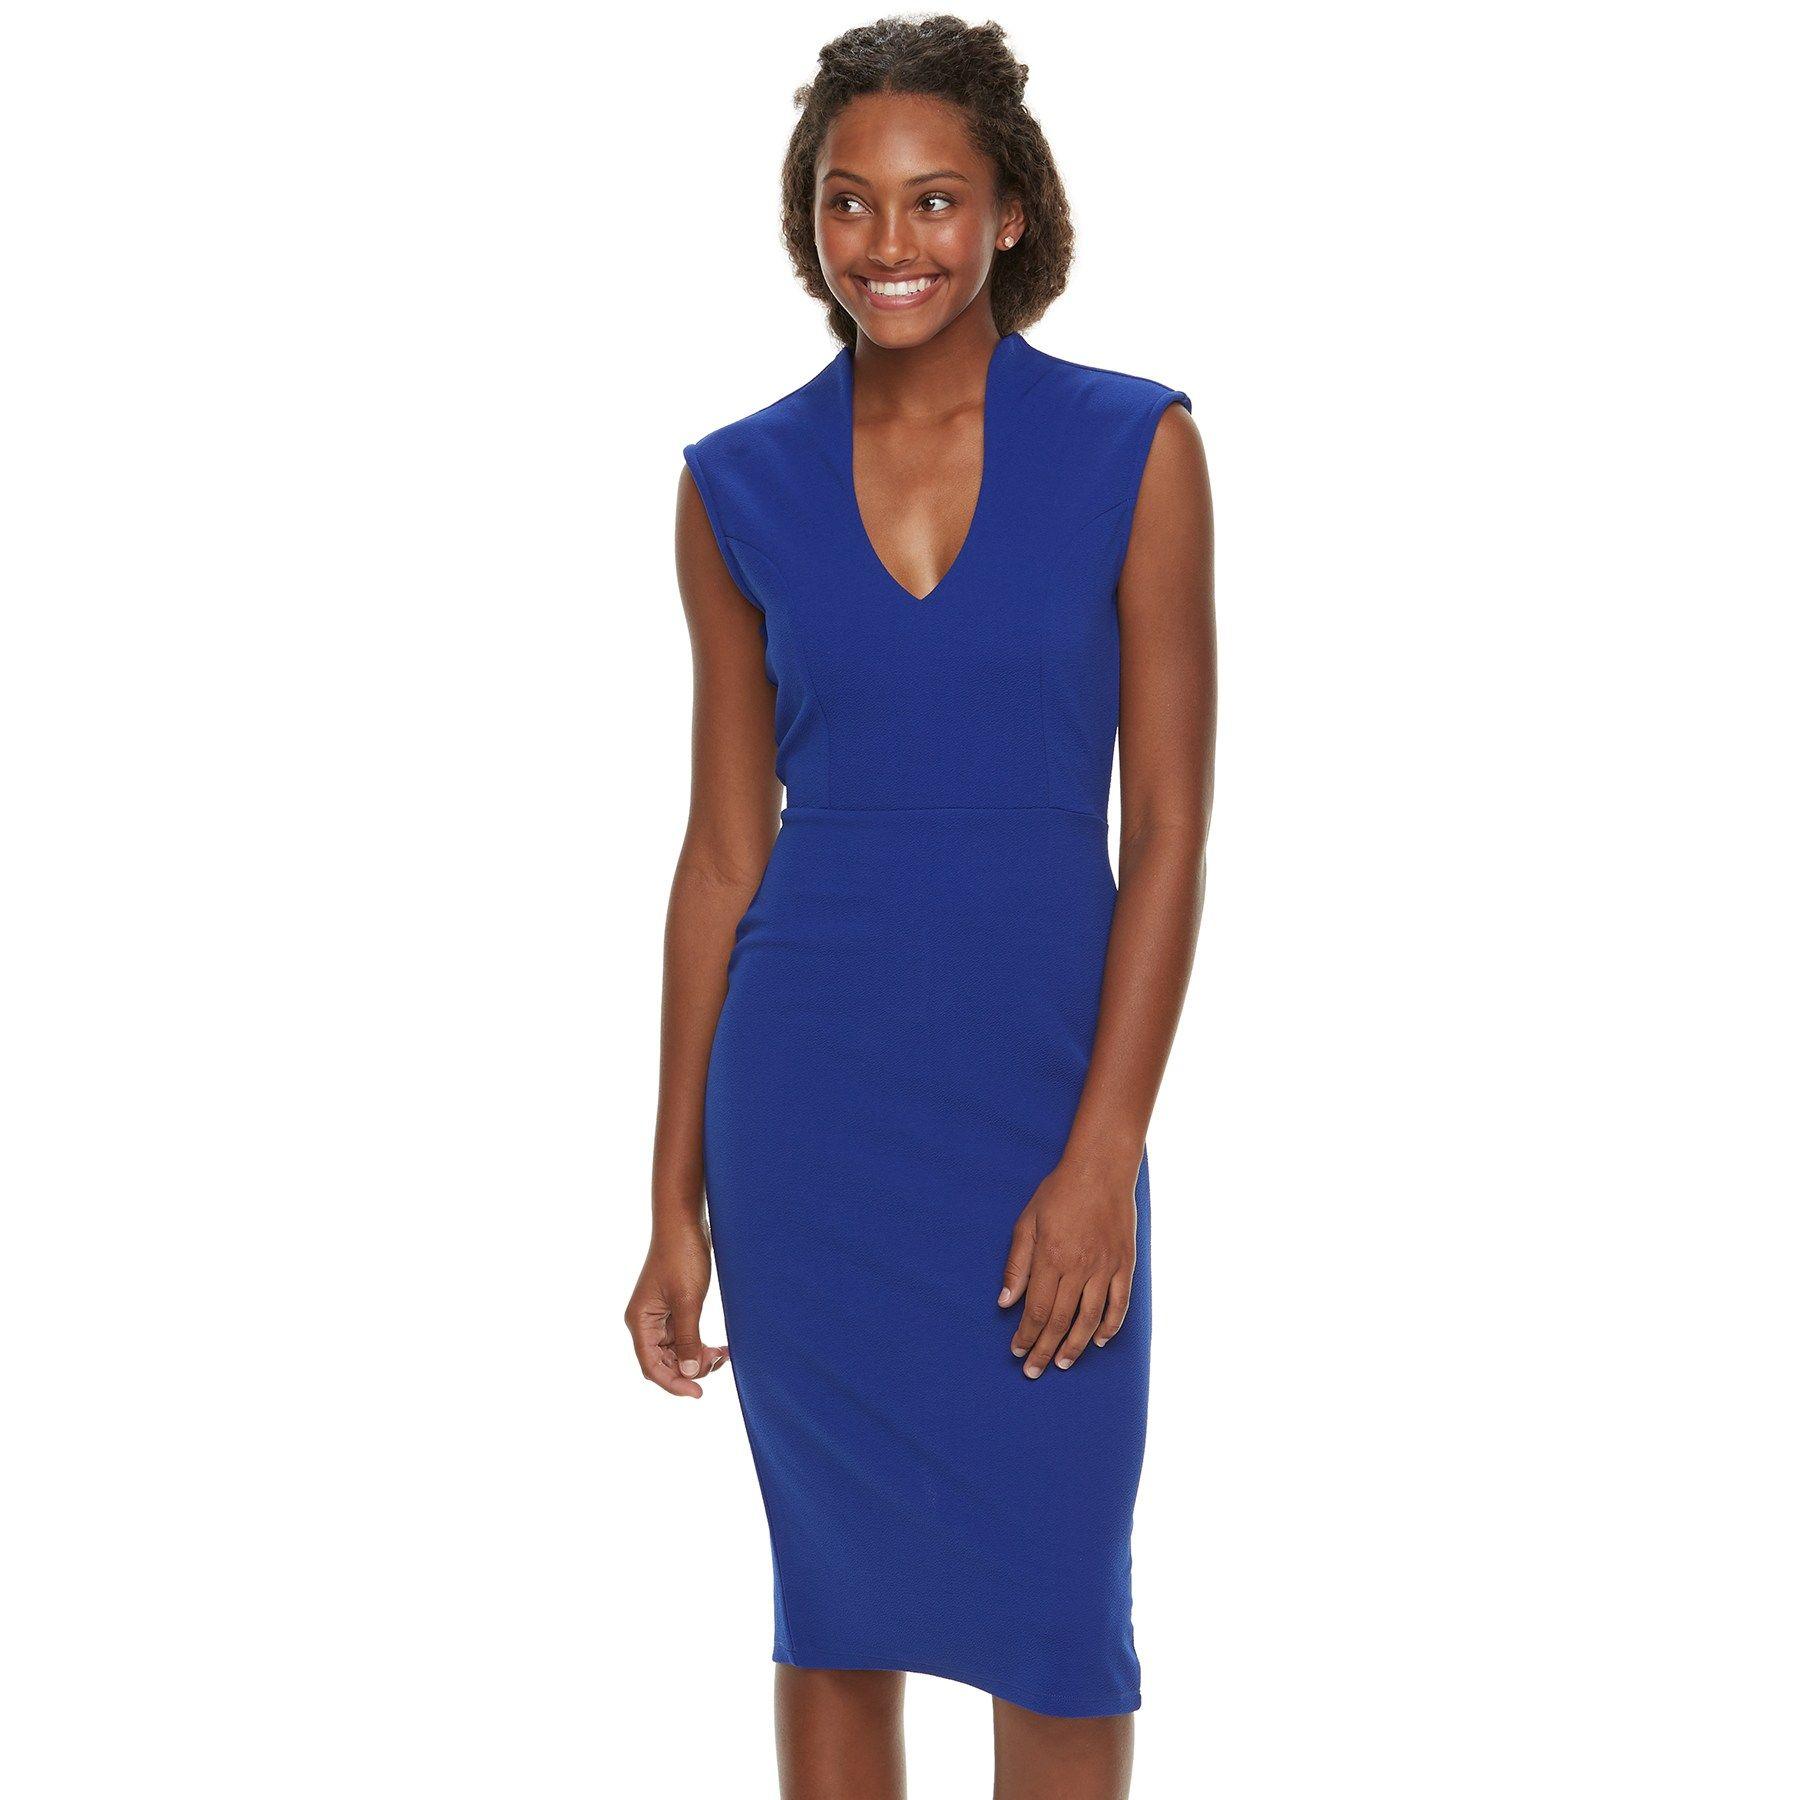 fa189f781692 12/9/18 Brand/Designer: Almost Famous Material: Polyester /Spandex Dress  Silhouette: Bodycon Shoulder: Sleeveless Neckline: V-Neck Closure/Back:  Back Zipper ...